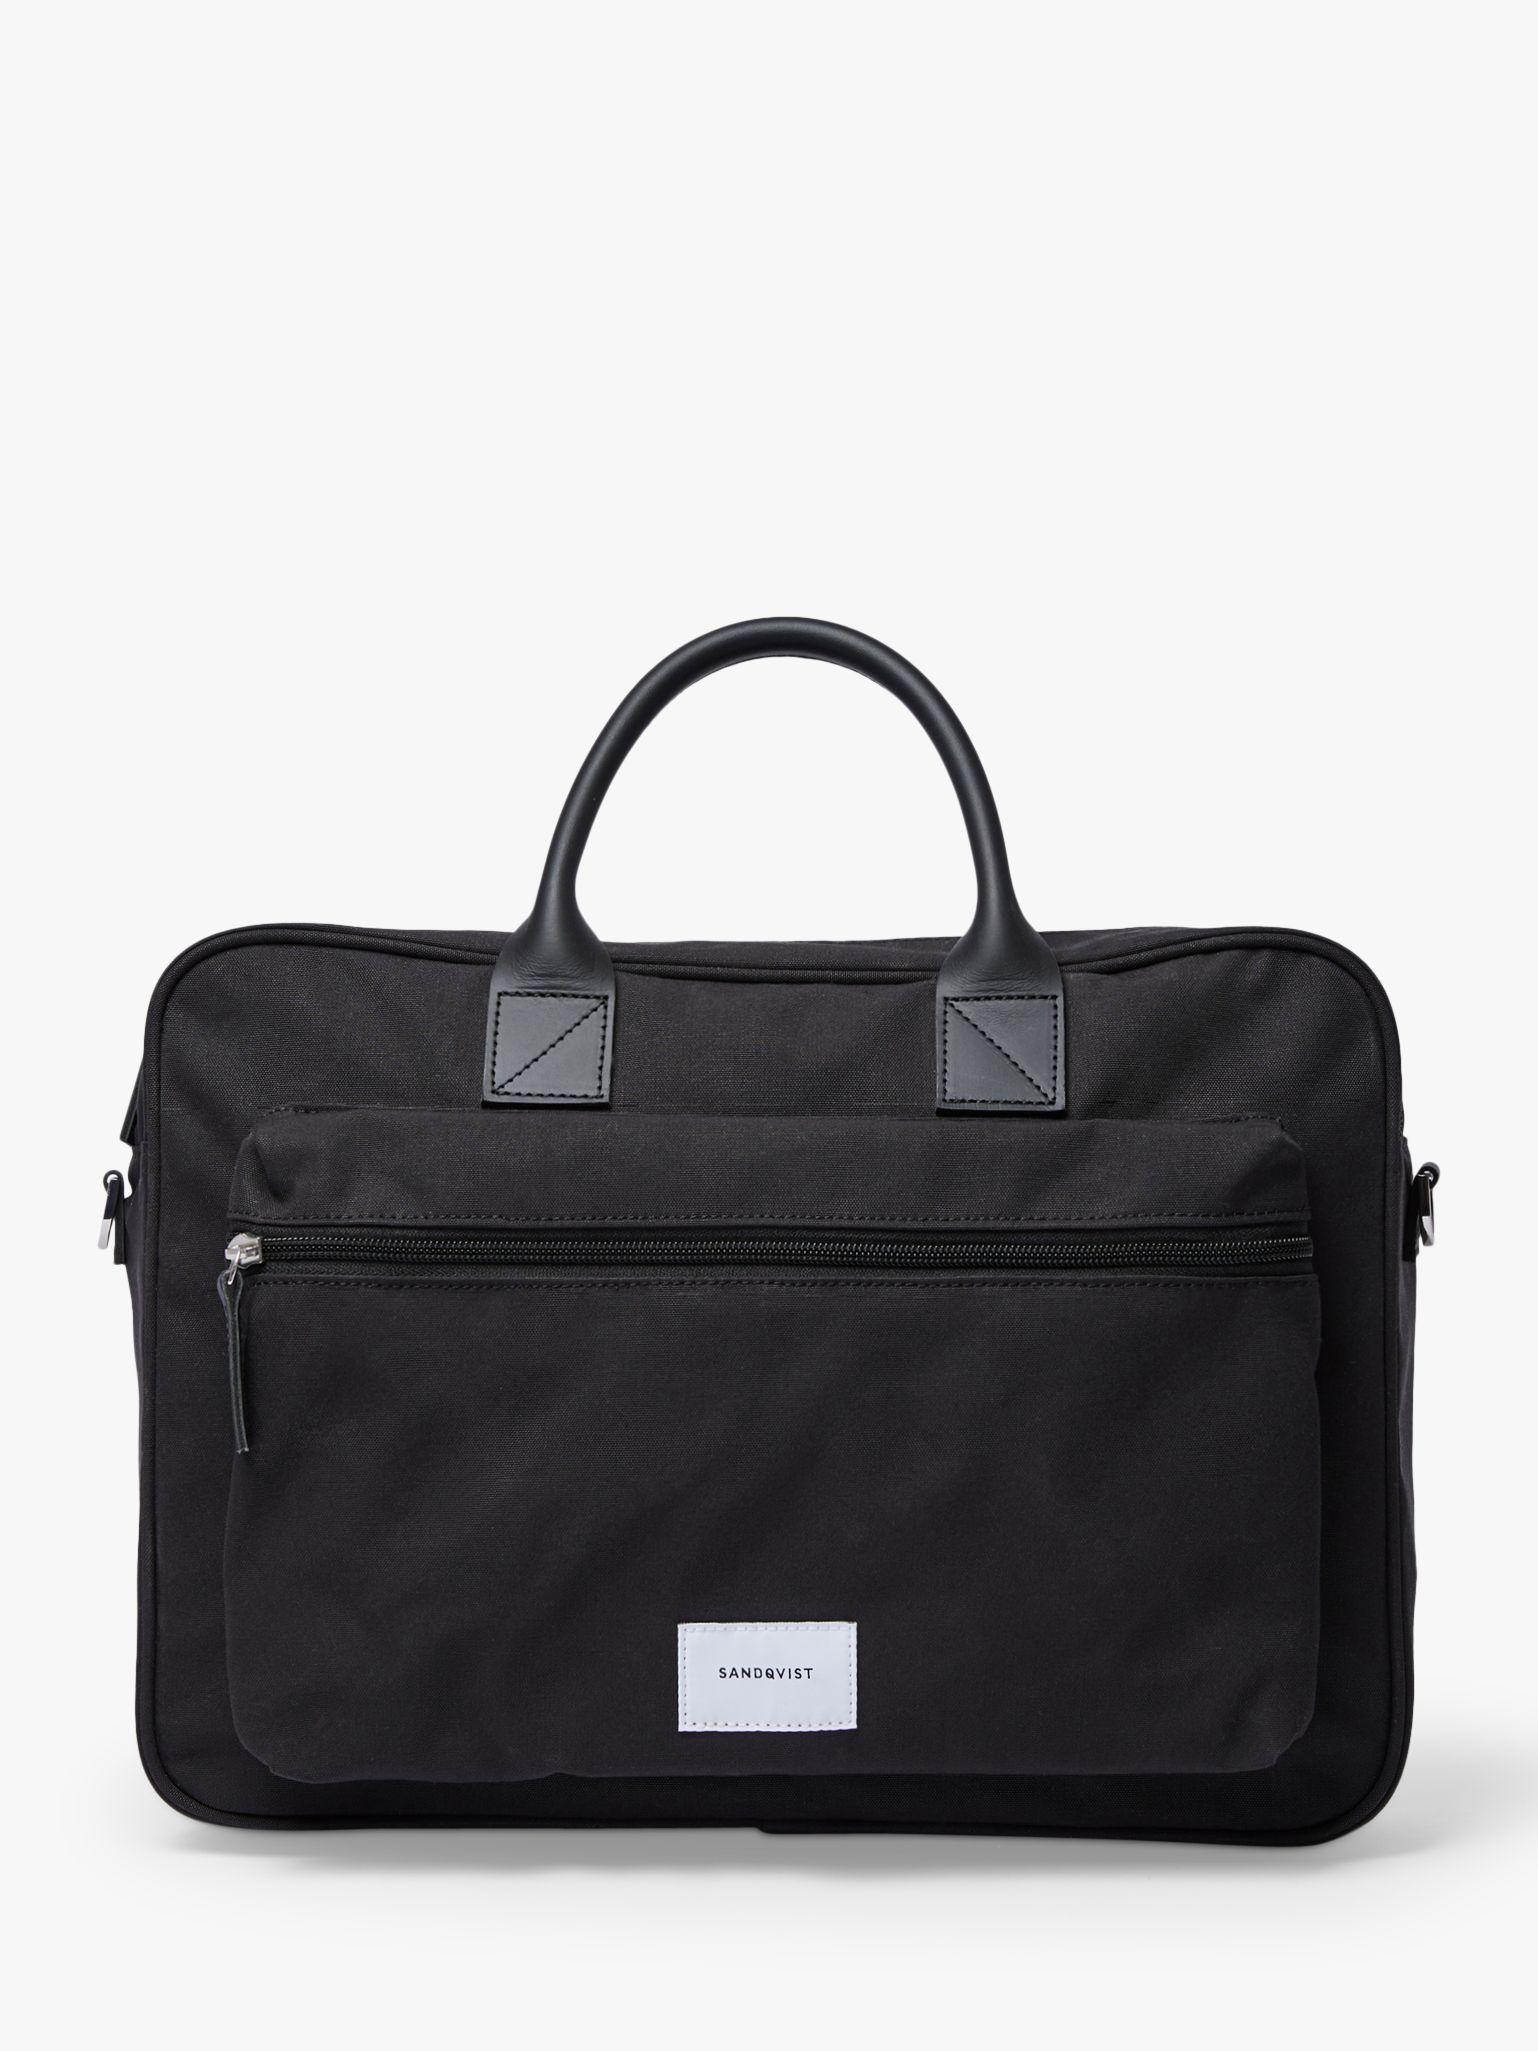 Sandqvist Sandqvist Emil Organic Cotton Crossbody Briefcase, Black